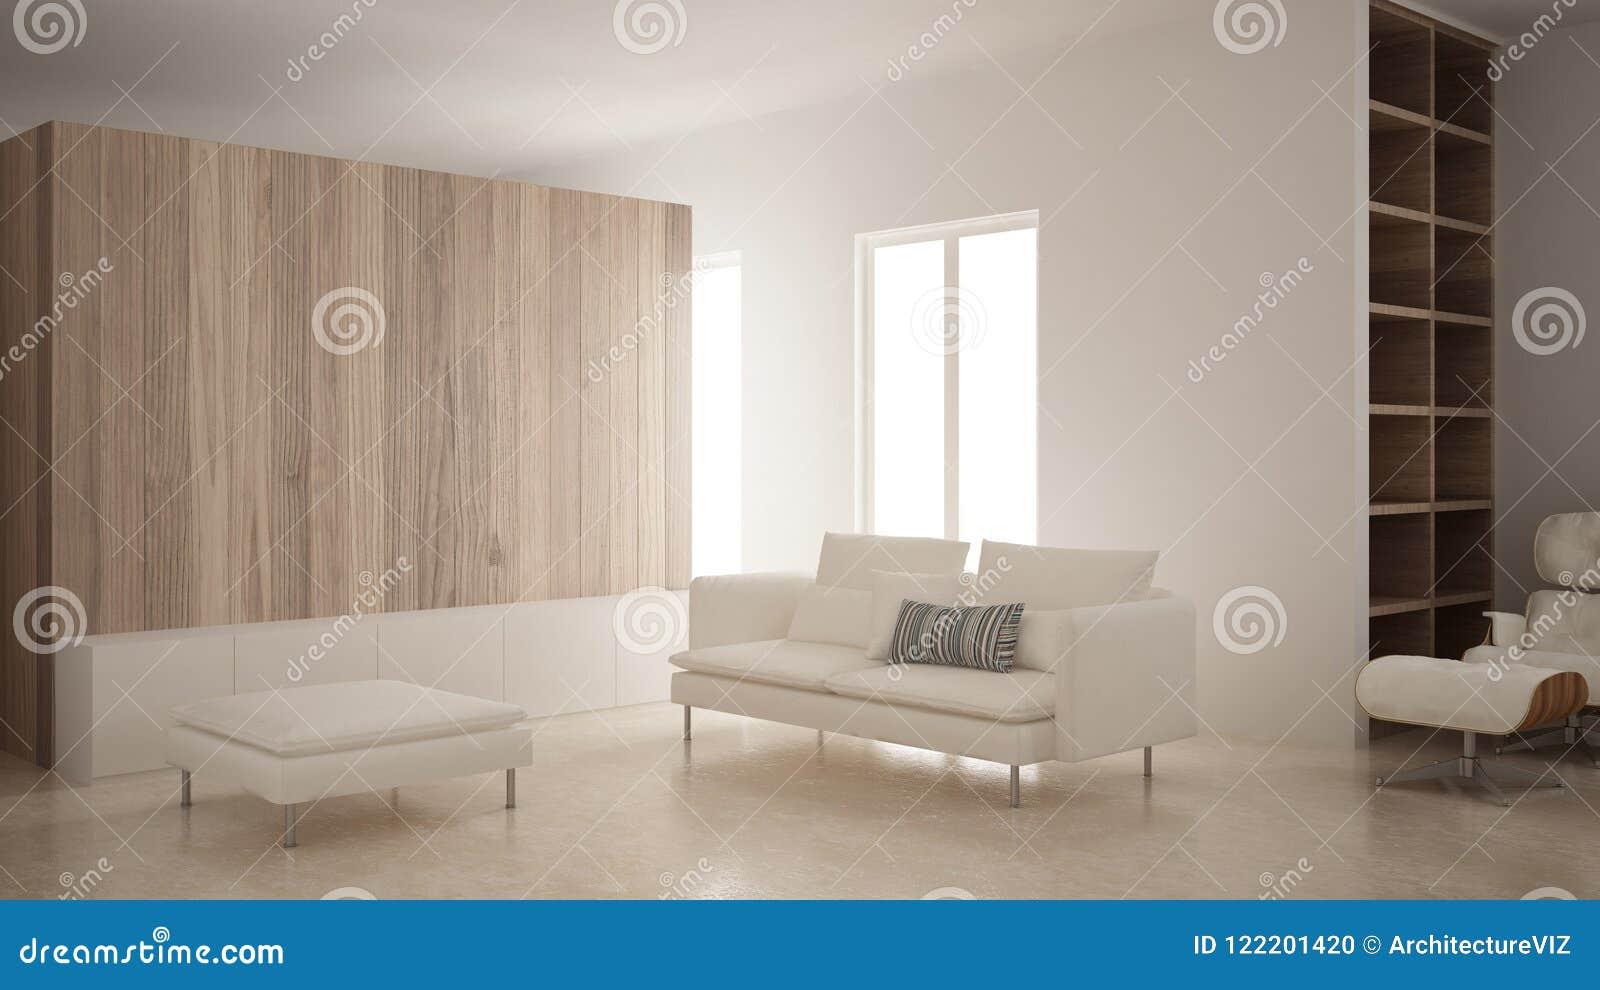 Design Bank Met Chaise Longue.Minimalism Moderne Woonkamer Met Houten Muur Bank Chaise Longue